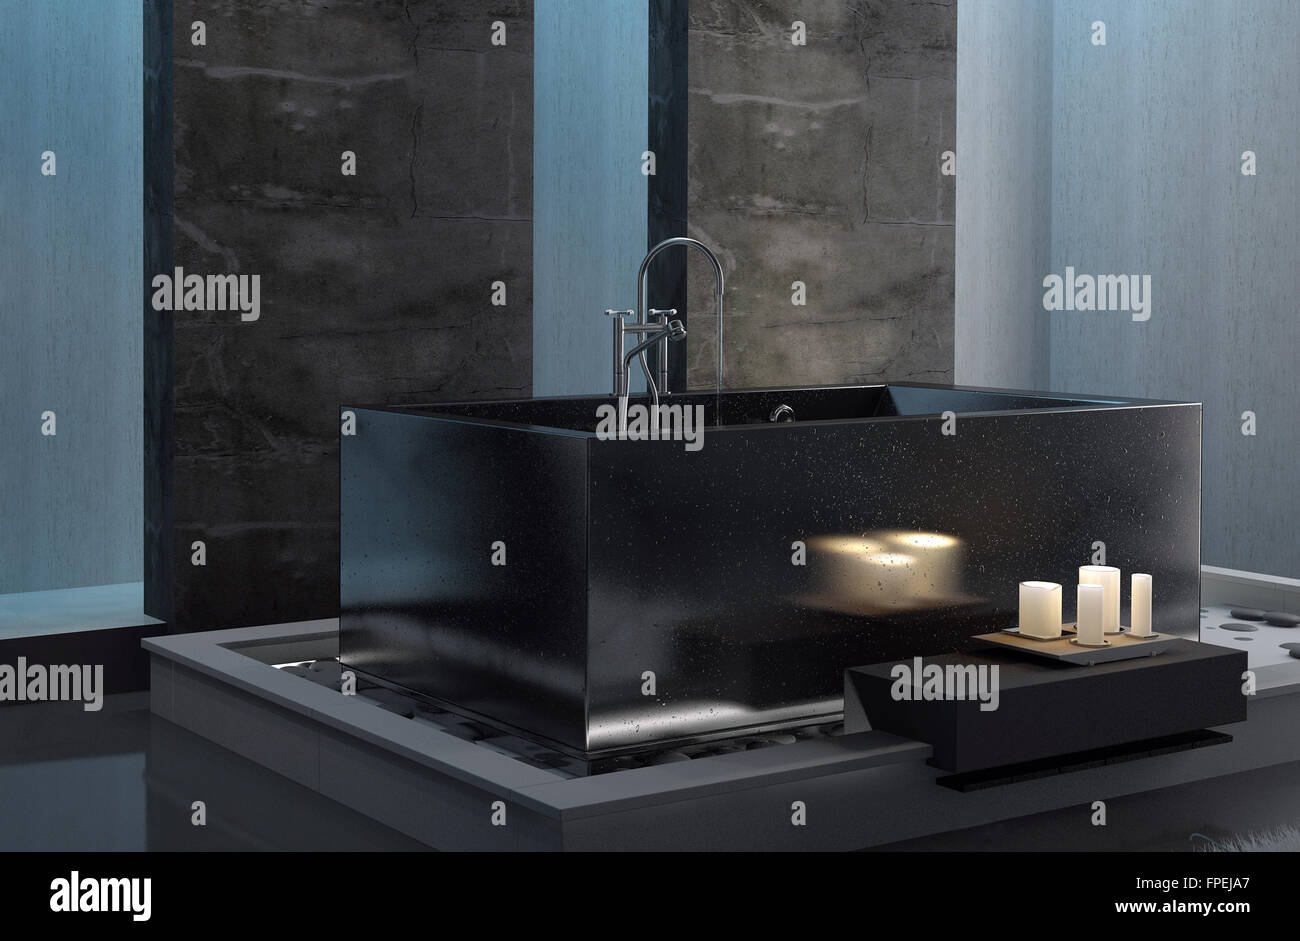 lighting freestanding stockfotos lighting freestanding bilder alamy. Black Bedroom Furniture Sets. Home Design Ideas